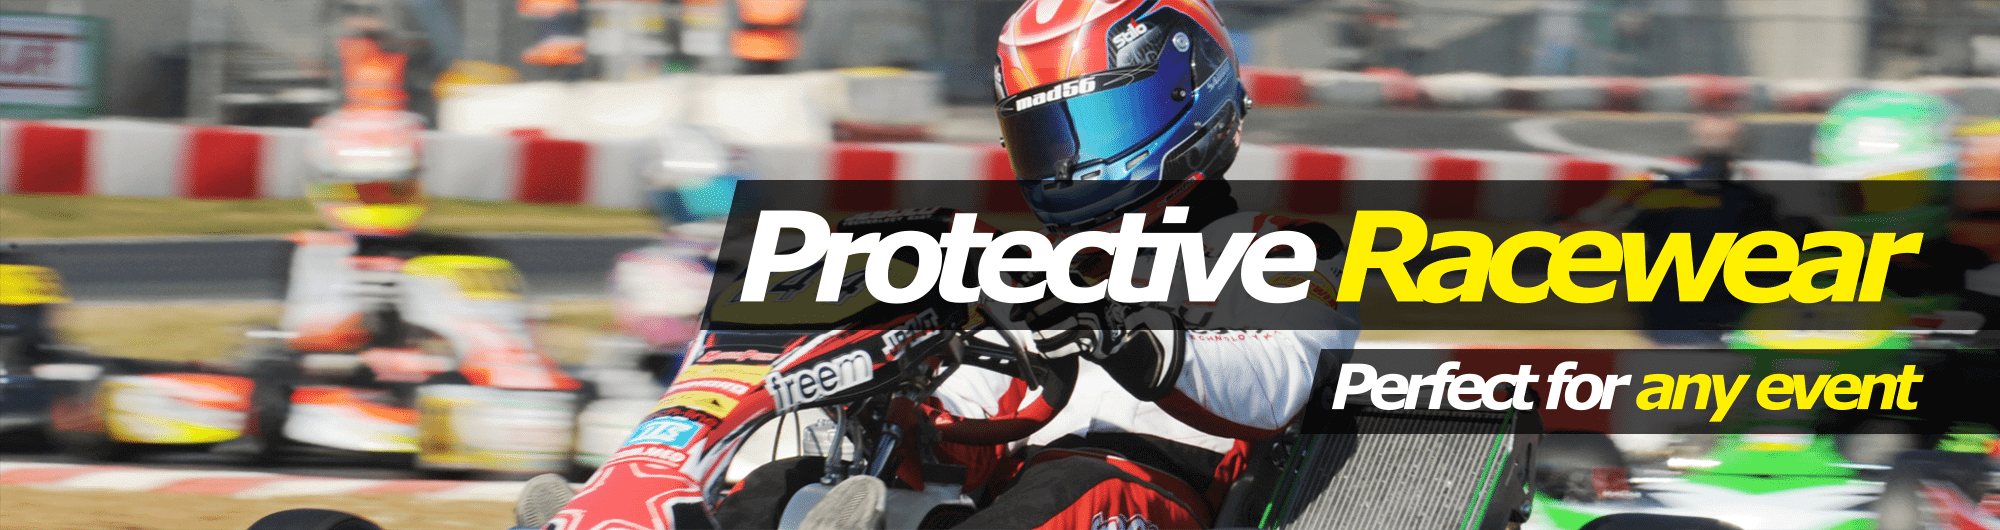 Protective Racewear Slider